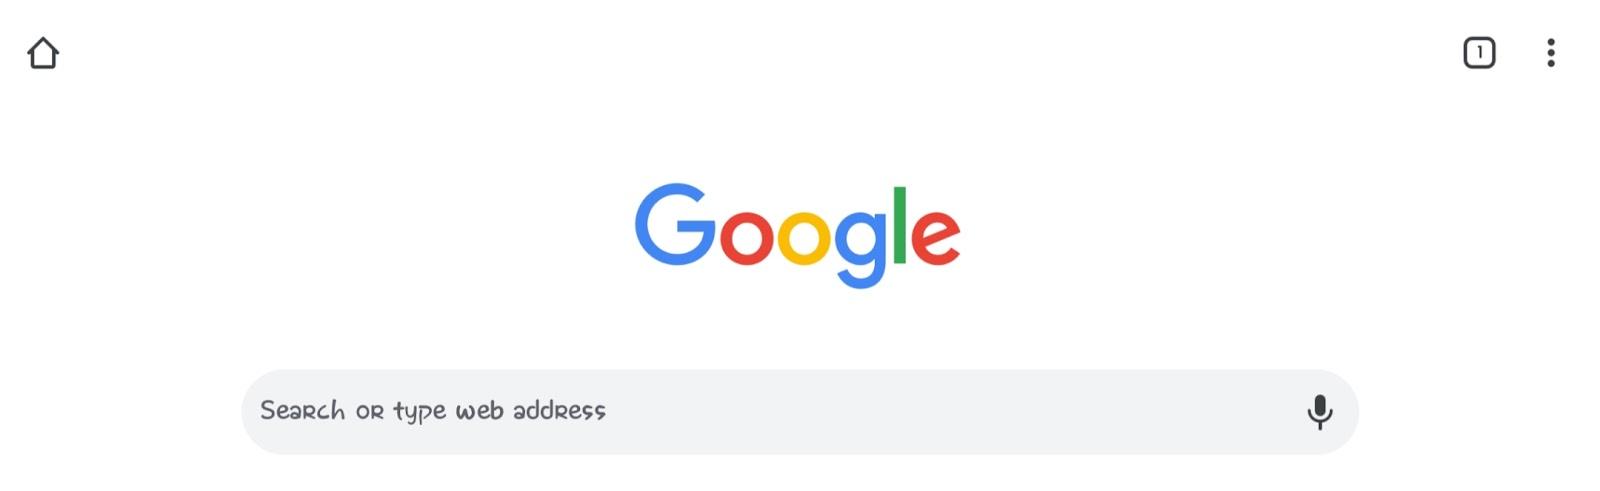 Google main page